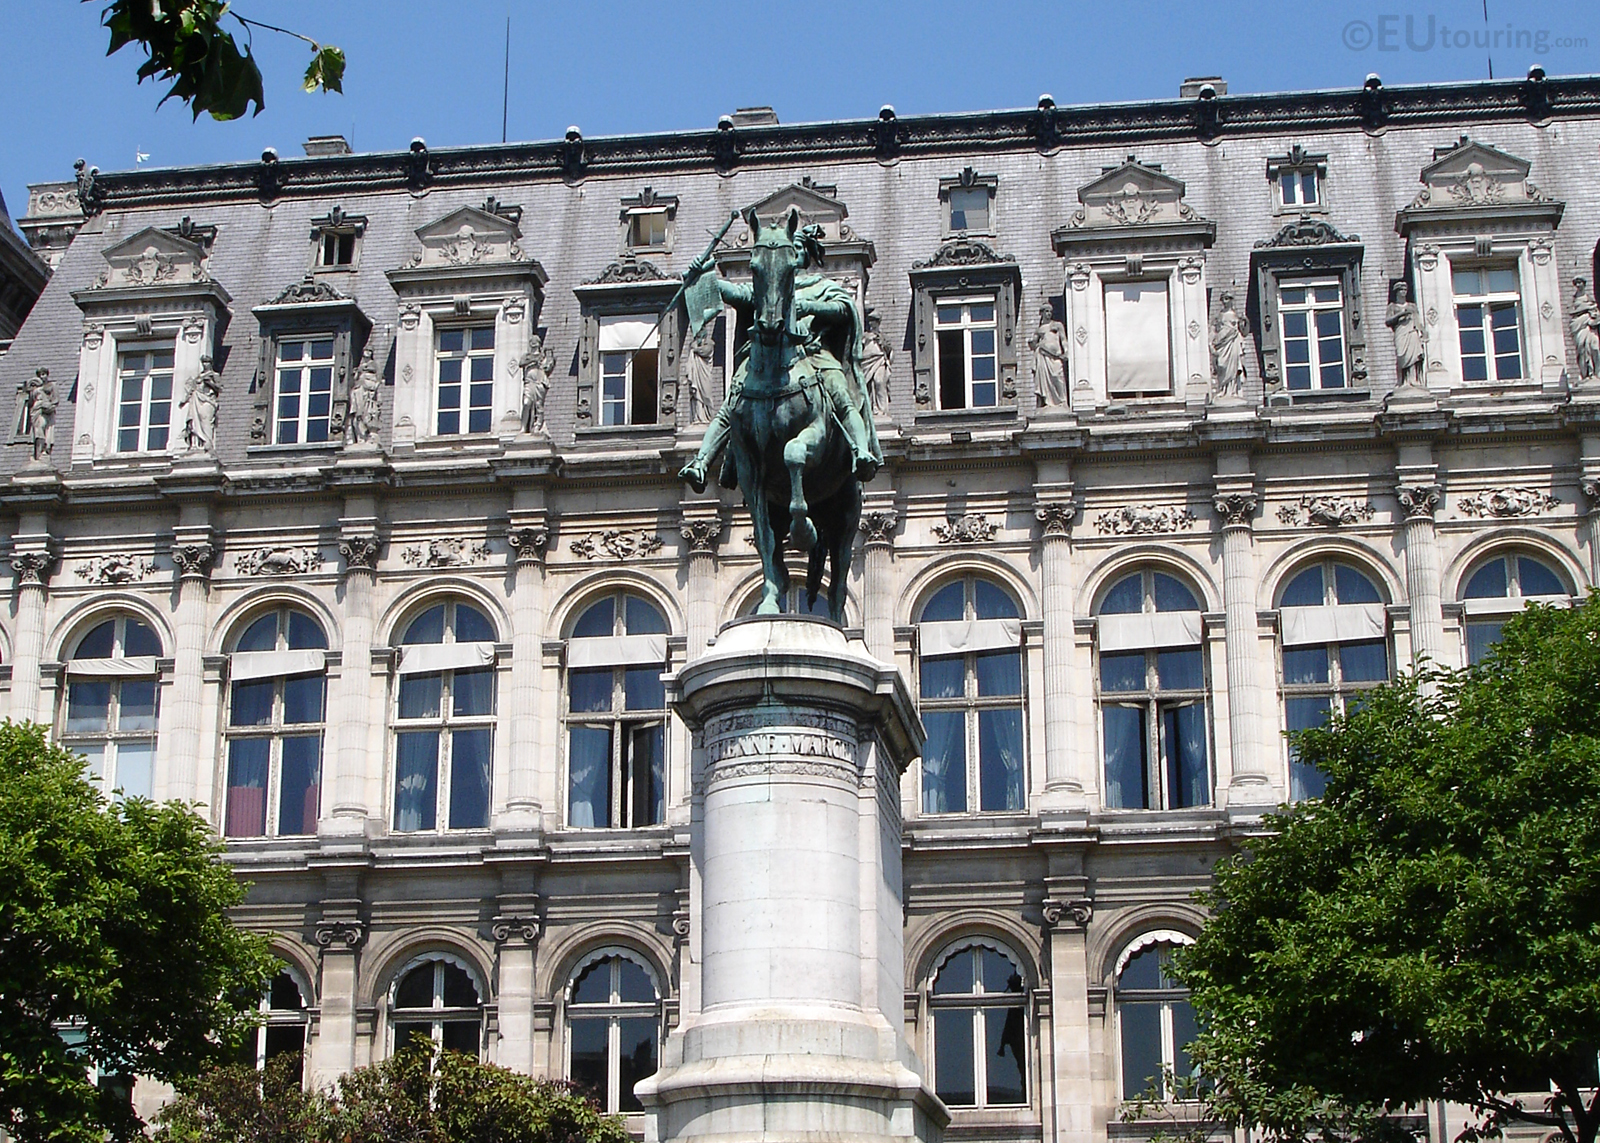 Statue of Etienne Marcel and Hotel de Ville